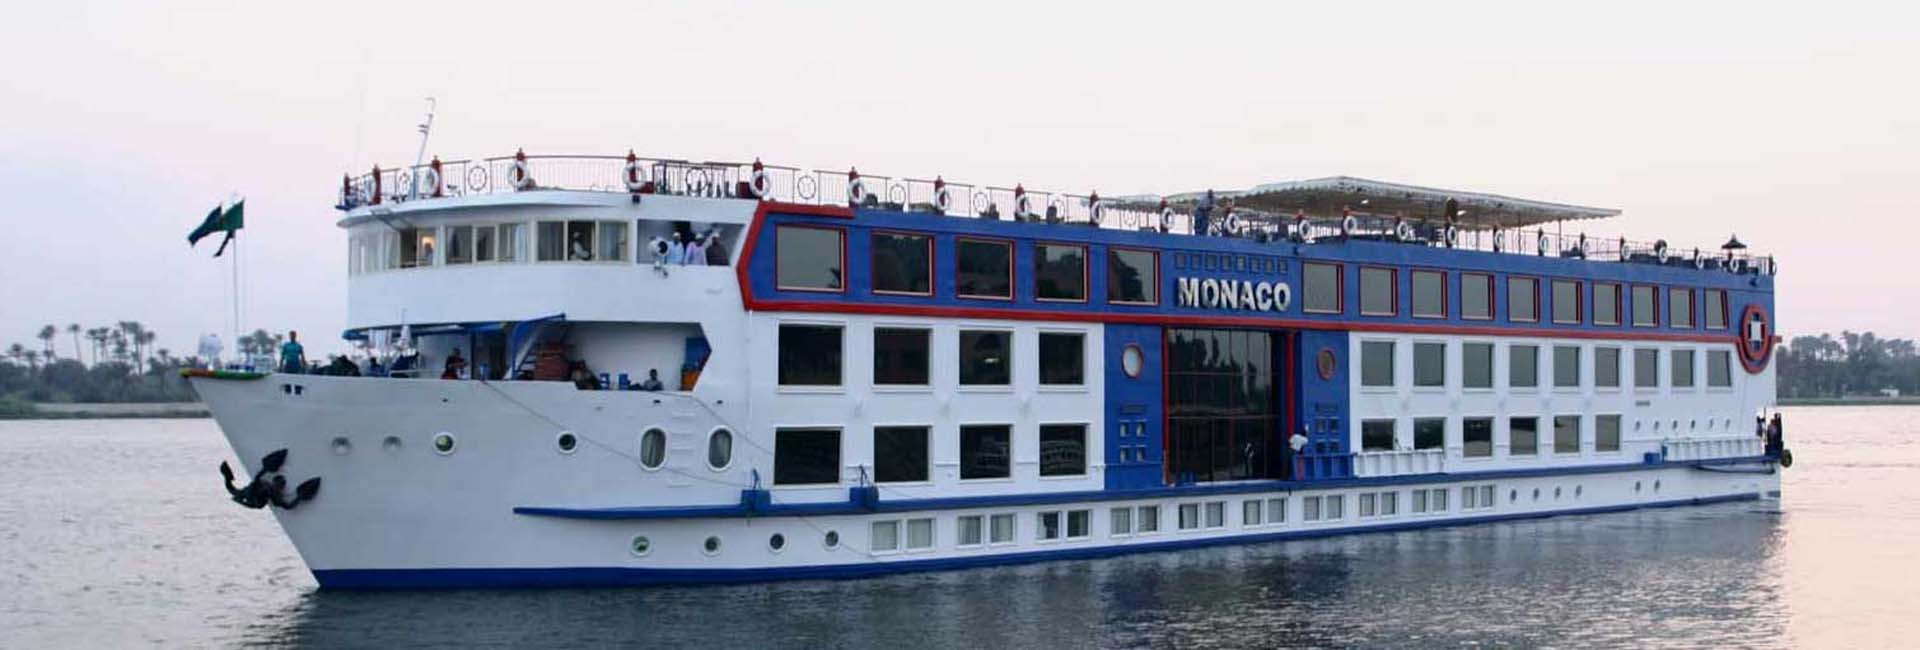 Monaco Nile Cruise